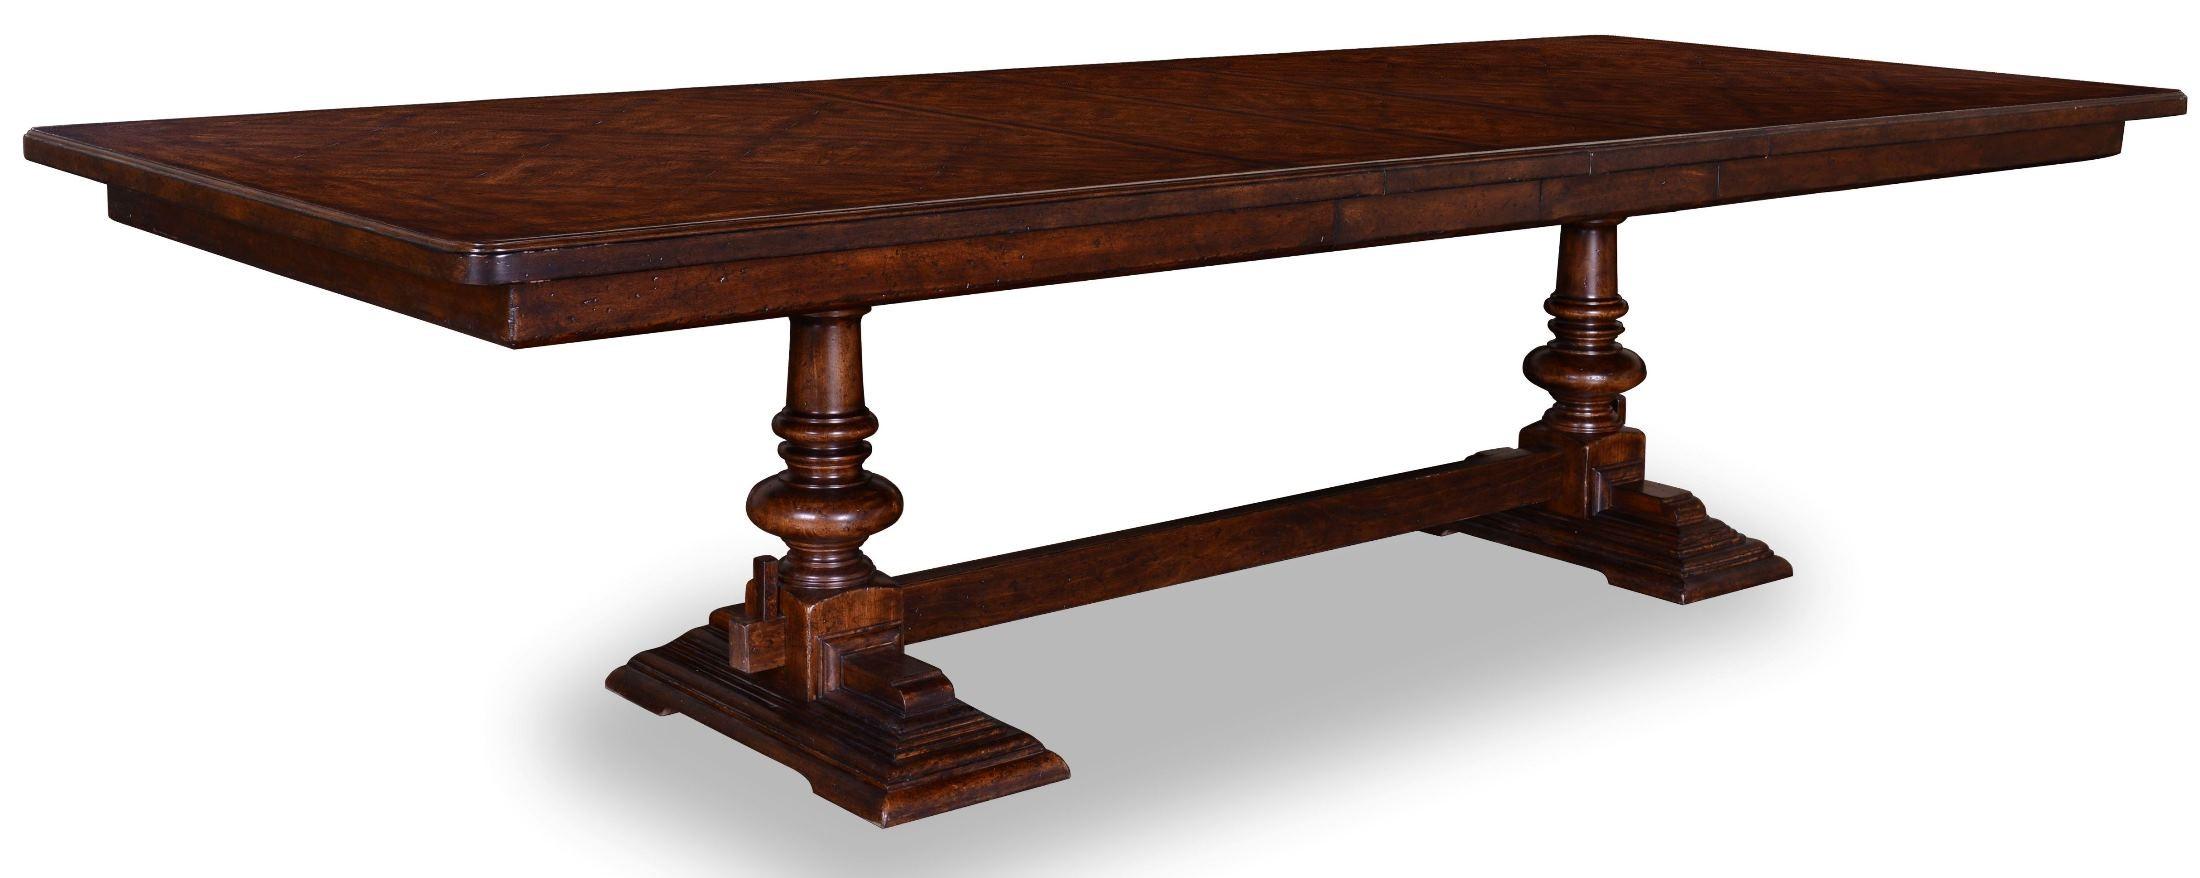 Whiskey barrel oak trestle dining room set from art for Dining room tables trestle